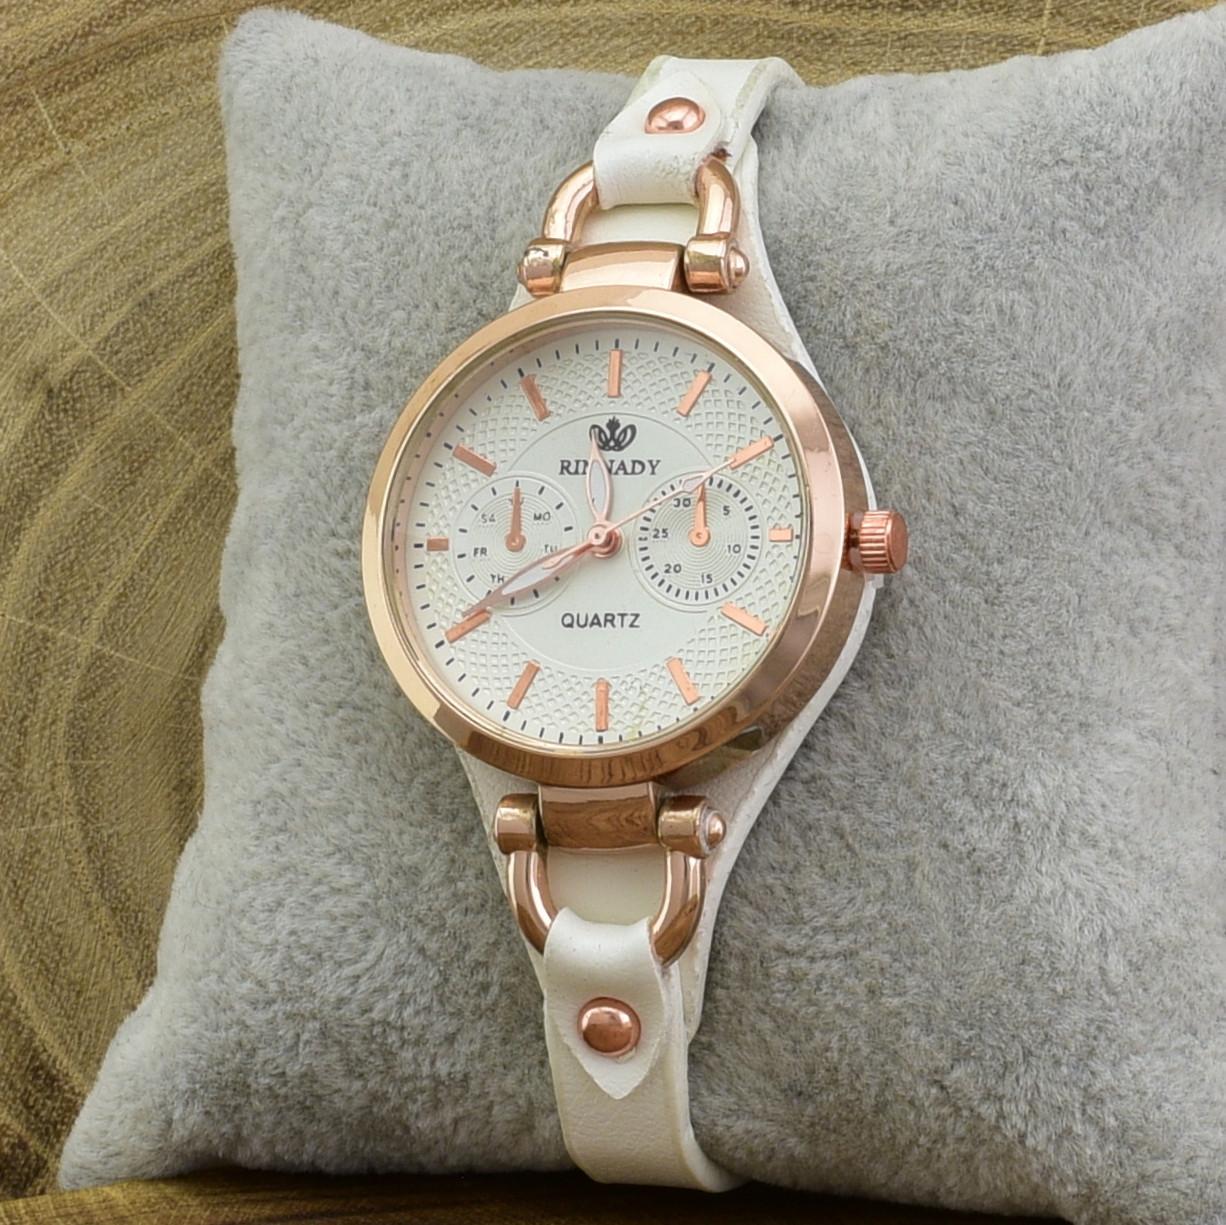 Часы G085расп пятна диаметр циферблата 3.2 см длина ремешка 16-20 см белый цвет позолота РО